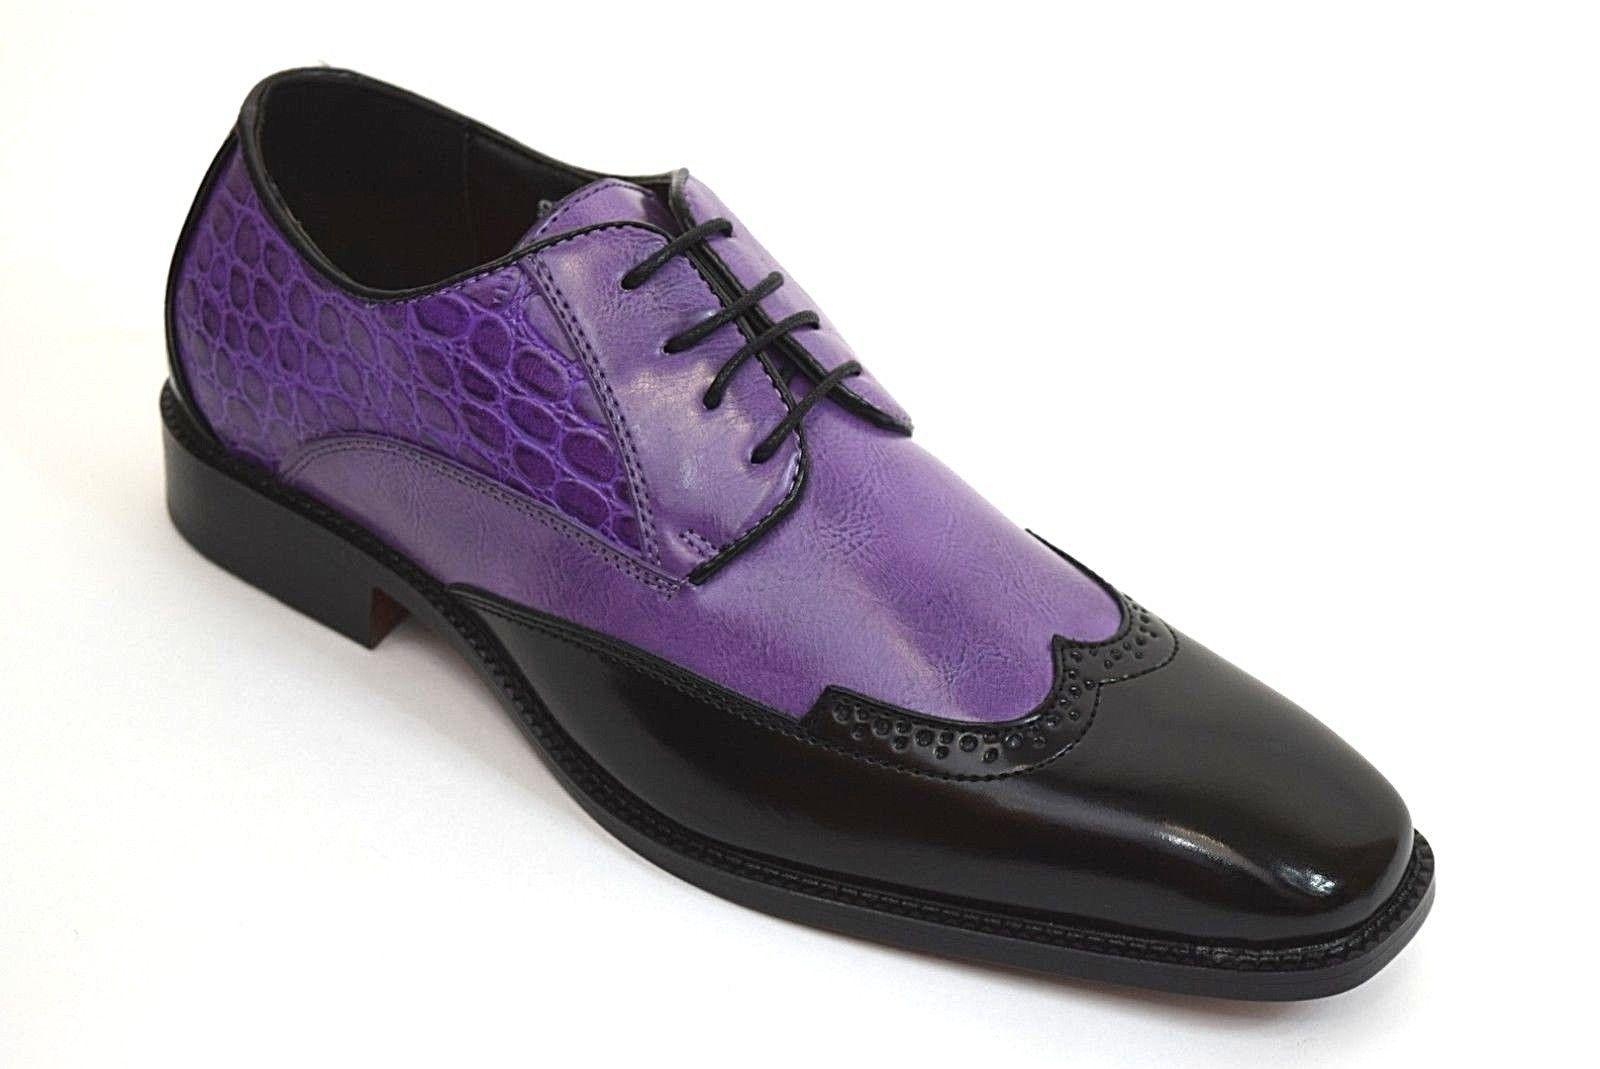 Mens Dress Shoes Black Purple Wing Tip Lace Up Gator Print Antonio Cerrelli 6680 Mens Black Dress Shoes Dress Shoes Men Shoes